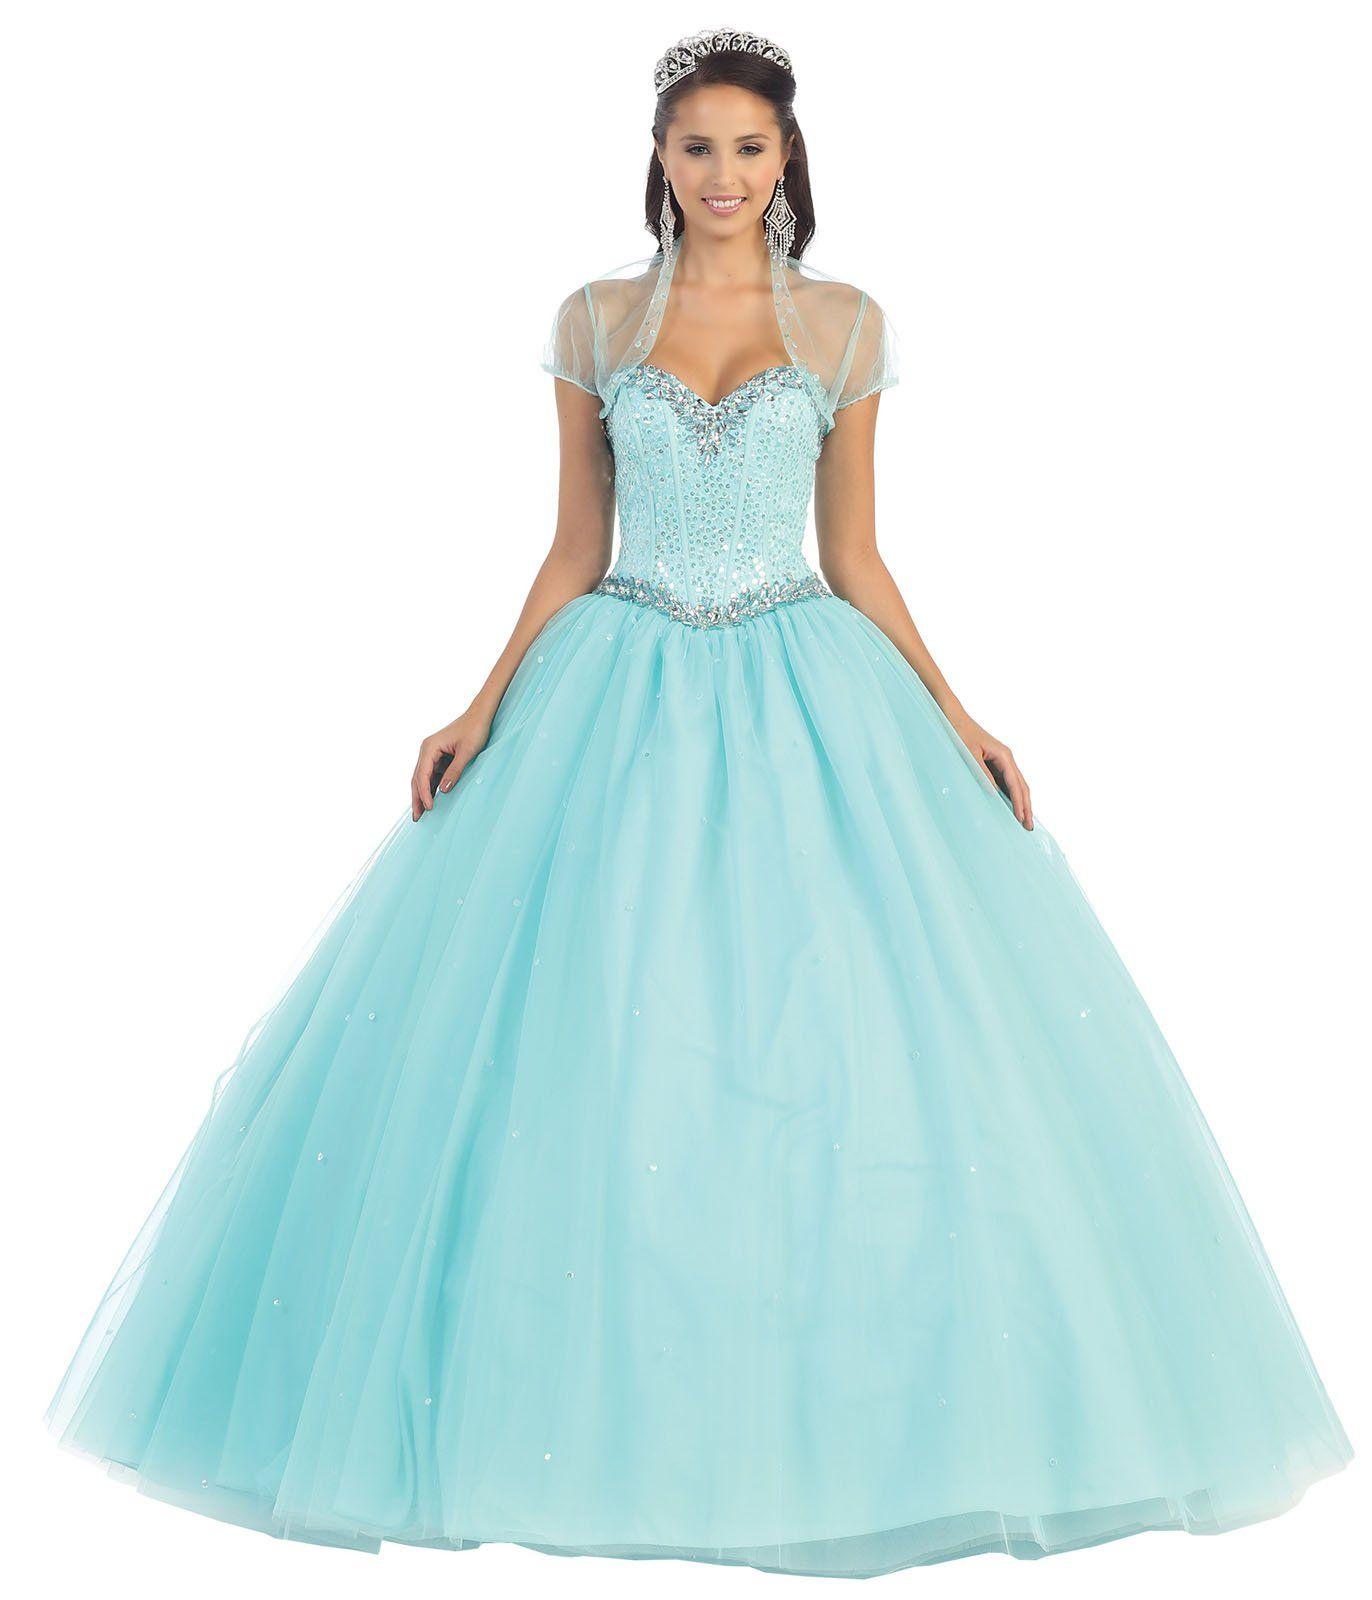 Layla K LK47 Sweetheart Cinderella Ball Gown (12, Aqua) | Apparel ...